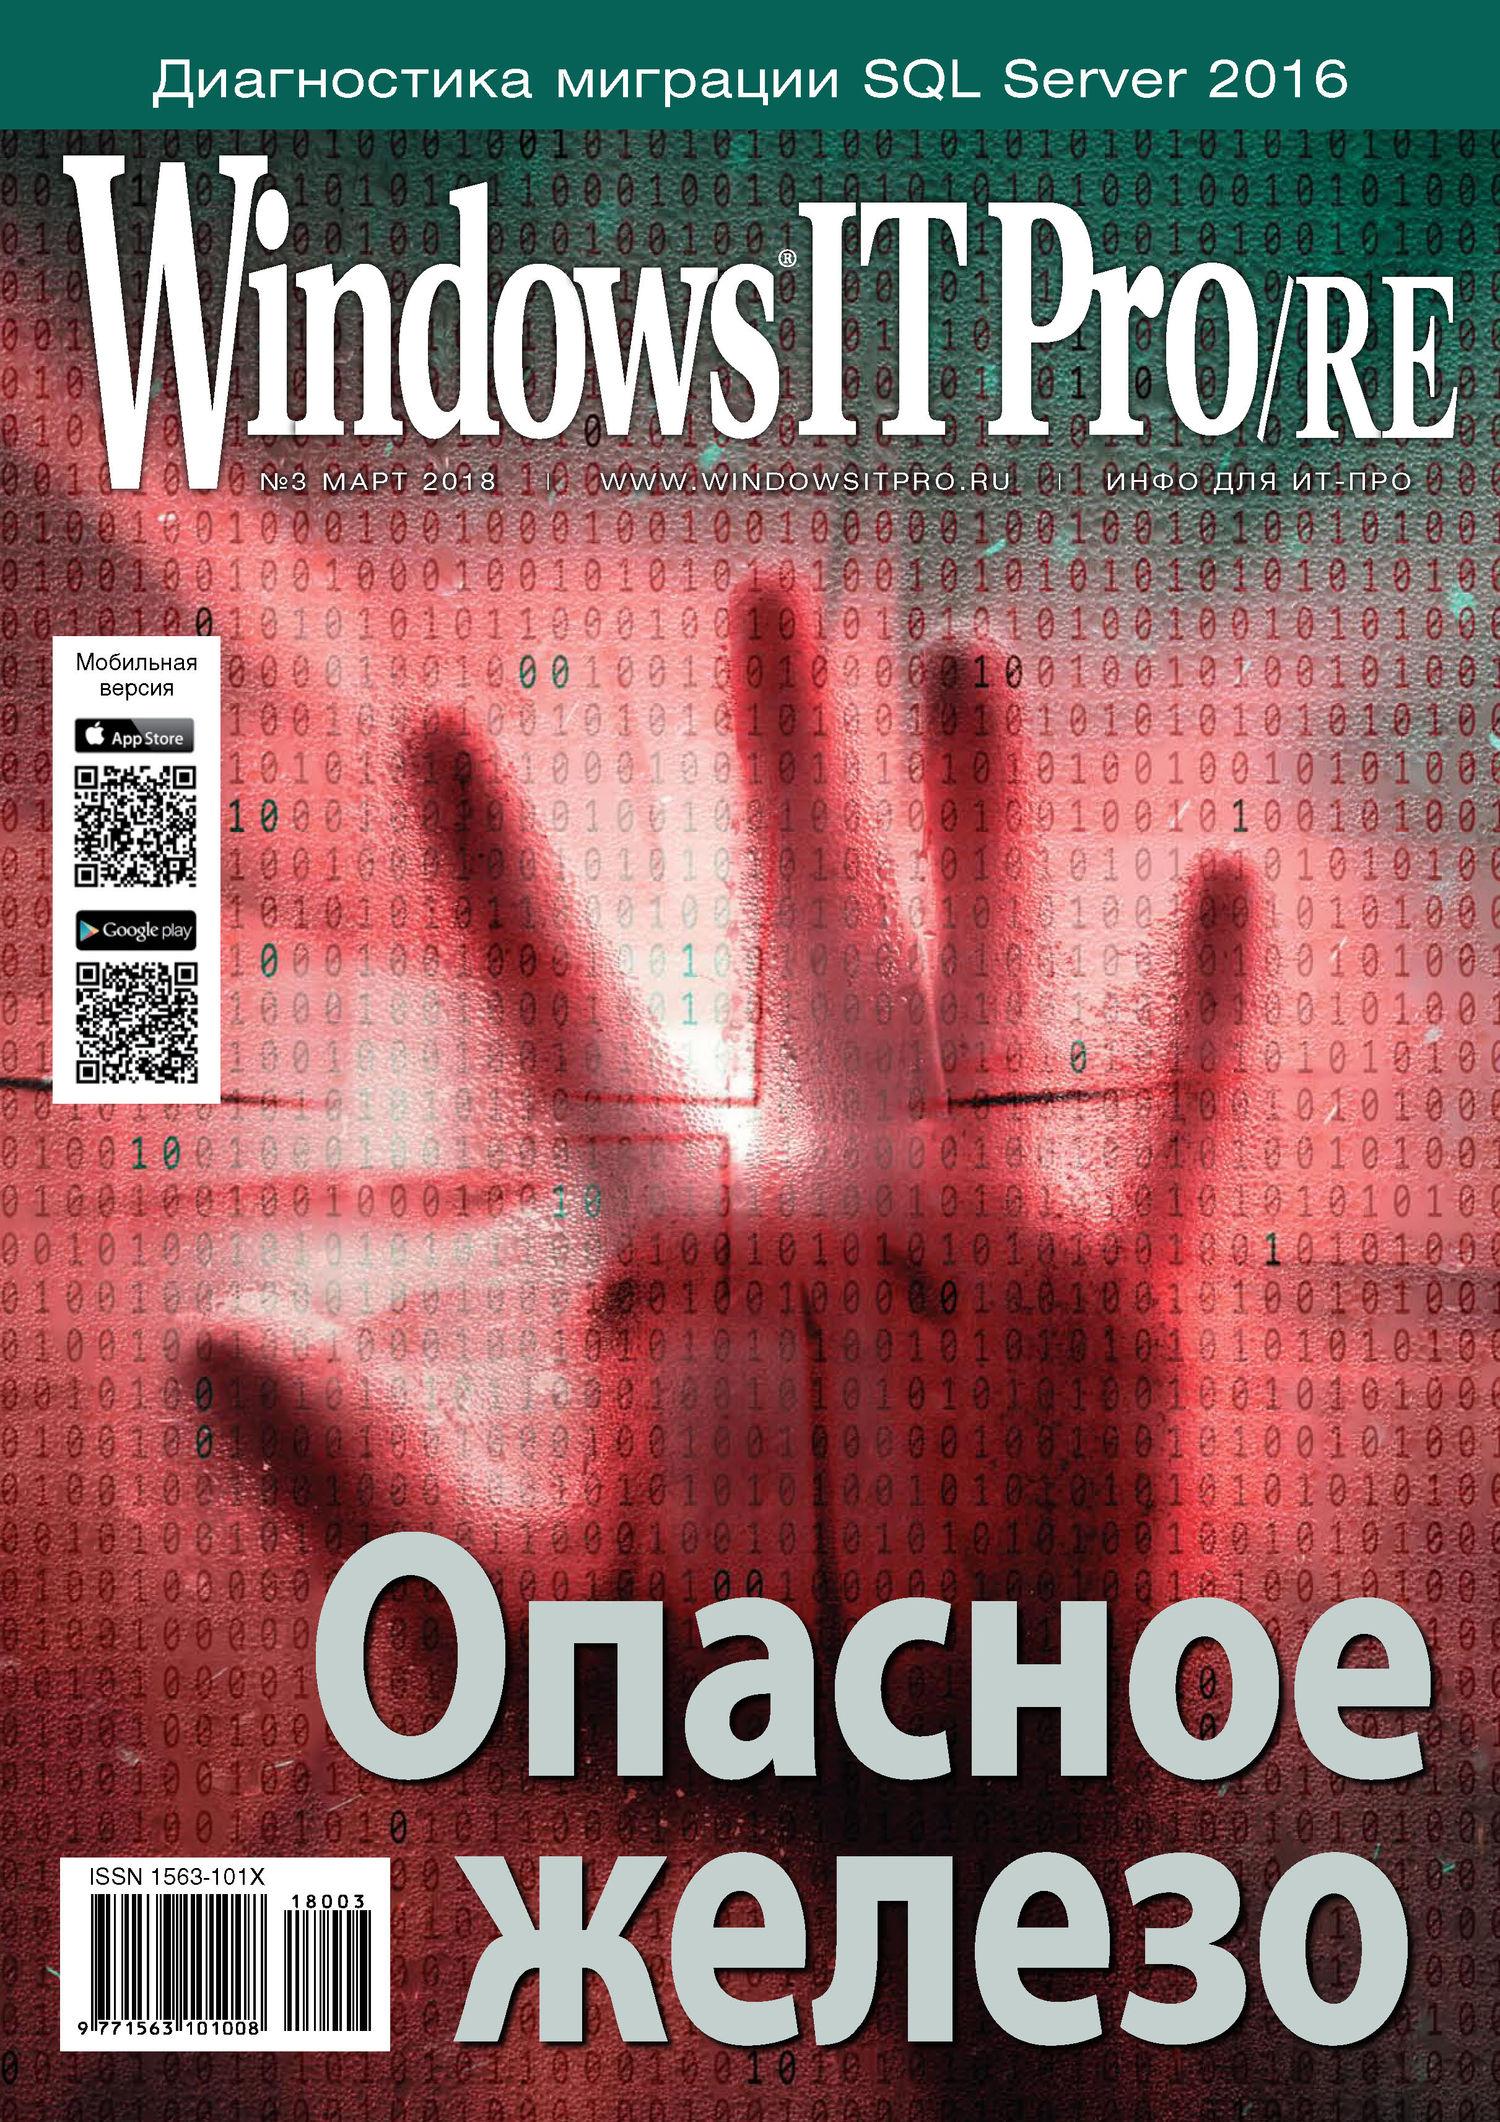 Открытые системы Windows IT Pro/RE №03/2018 открытые системы windows it pro re 12 2013